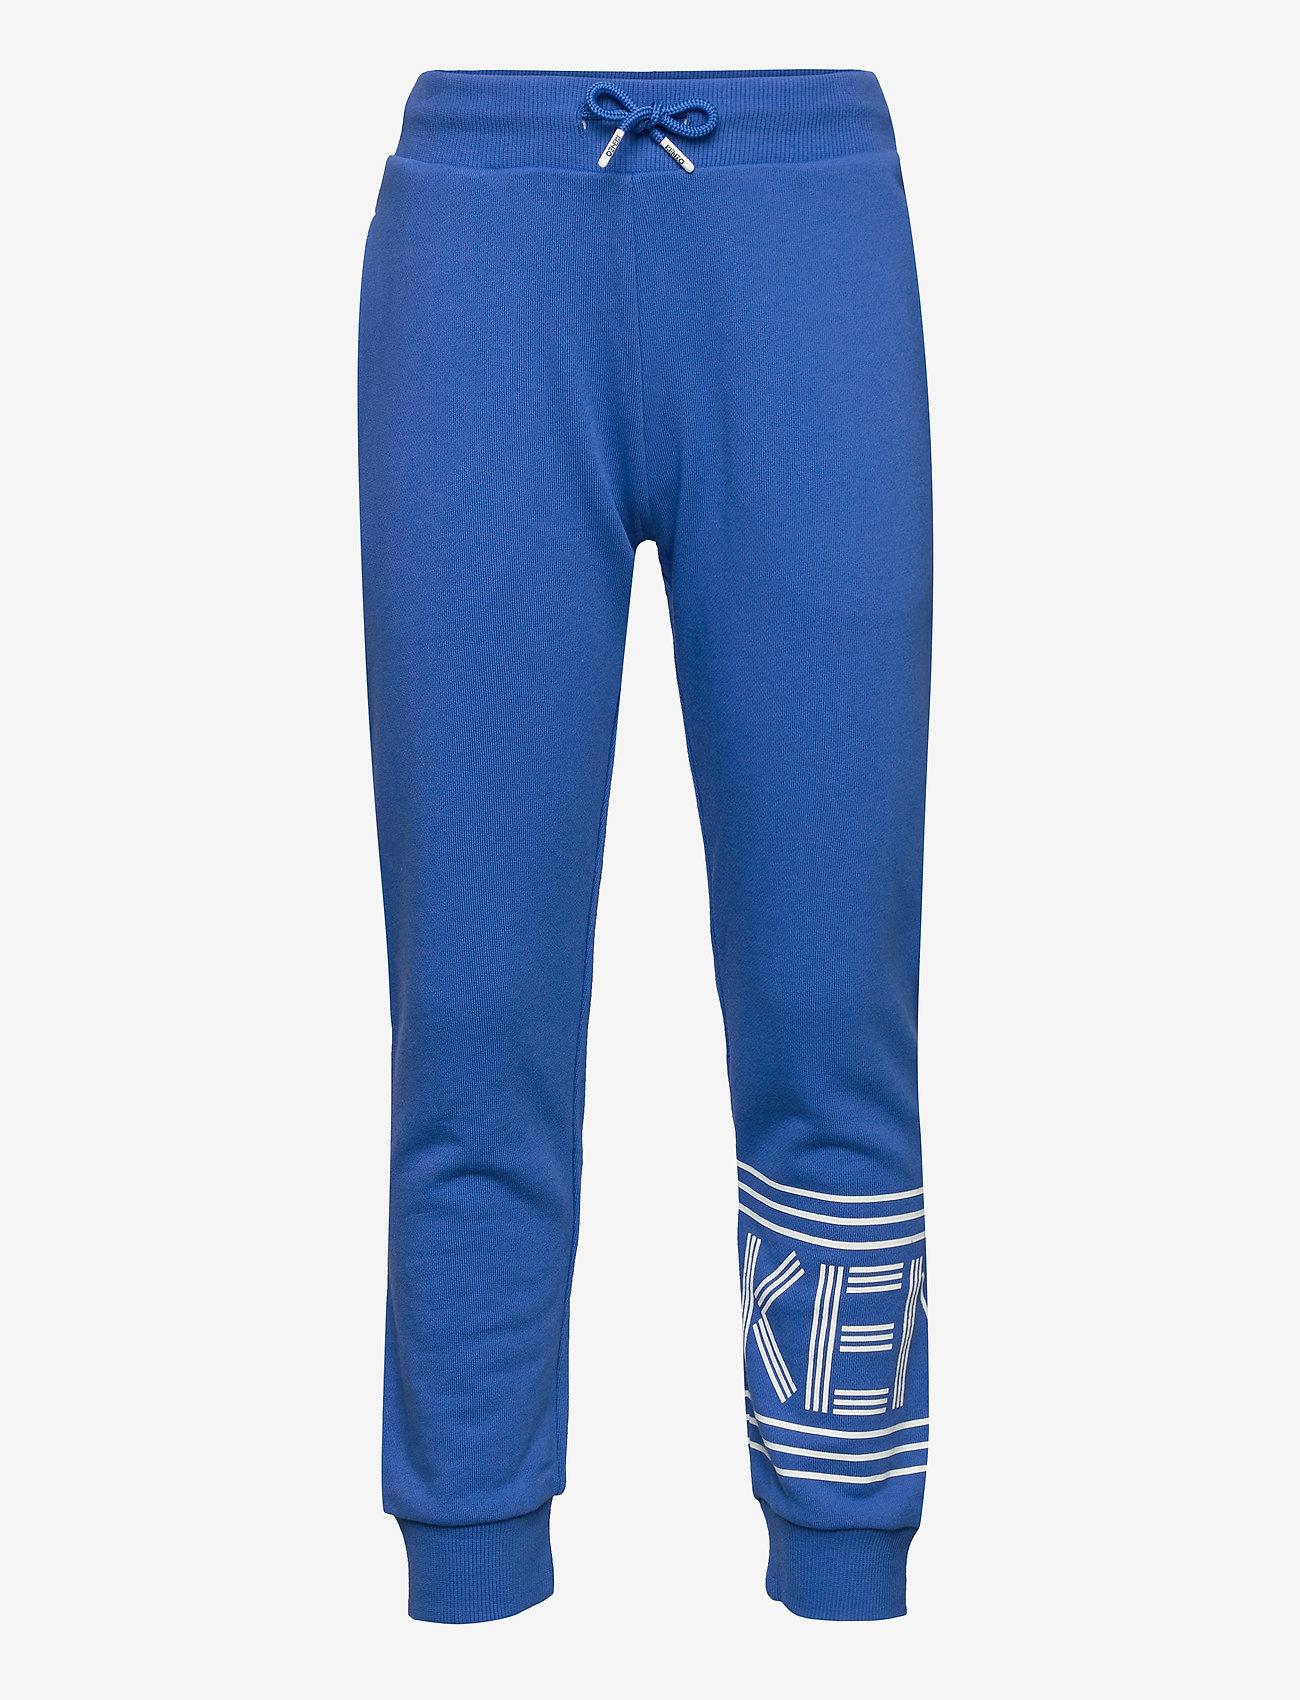 Kenzo - LOGO JB 15 - sweatpants - royal blue - 0